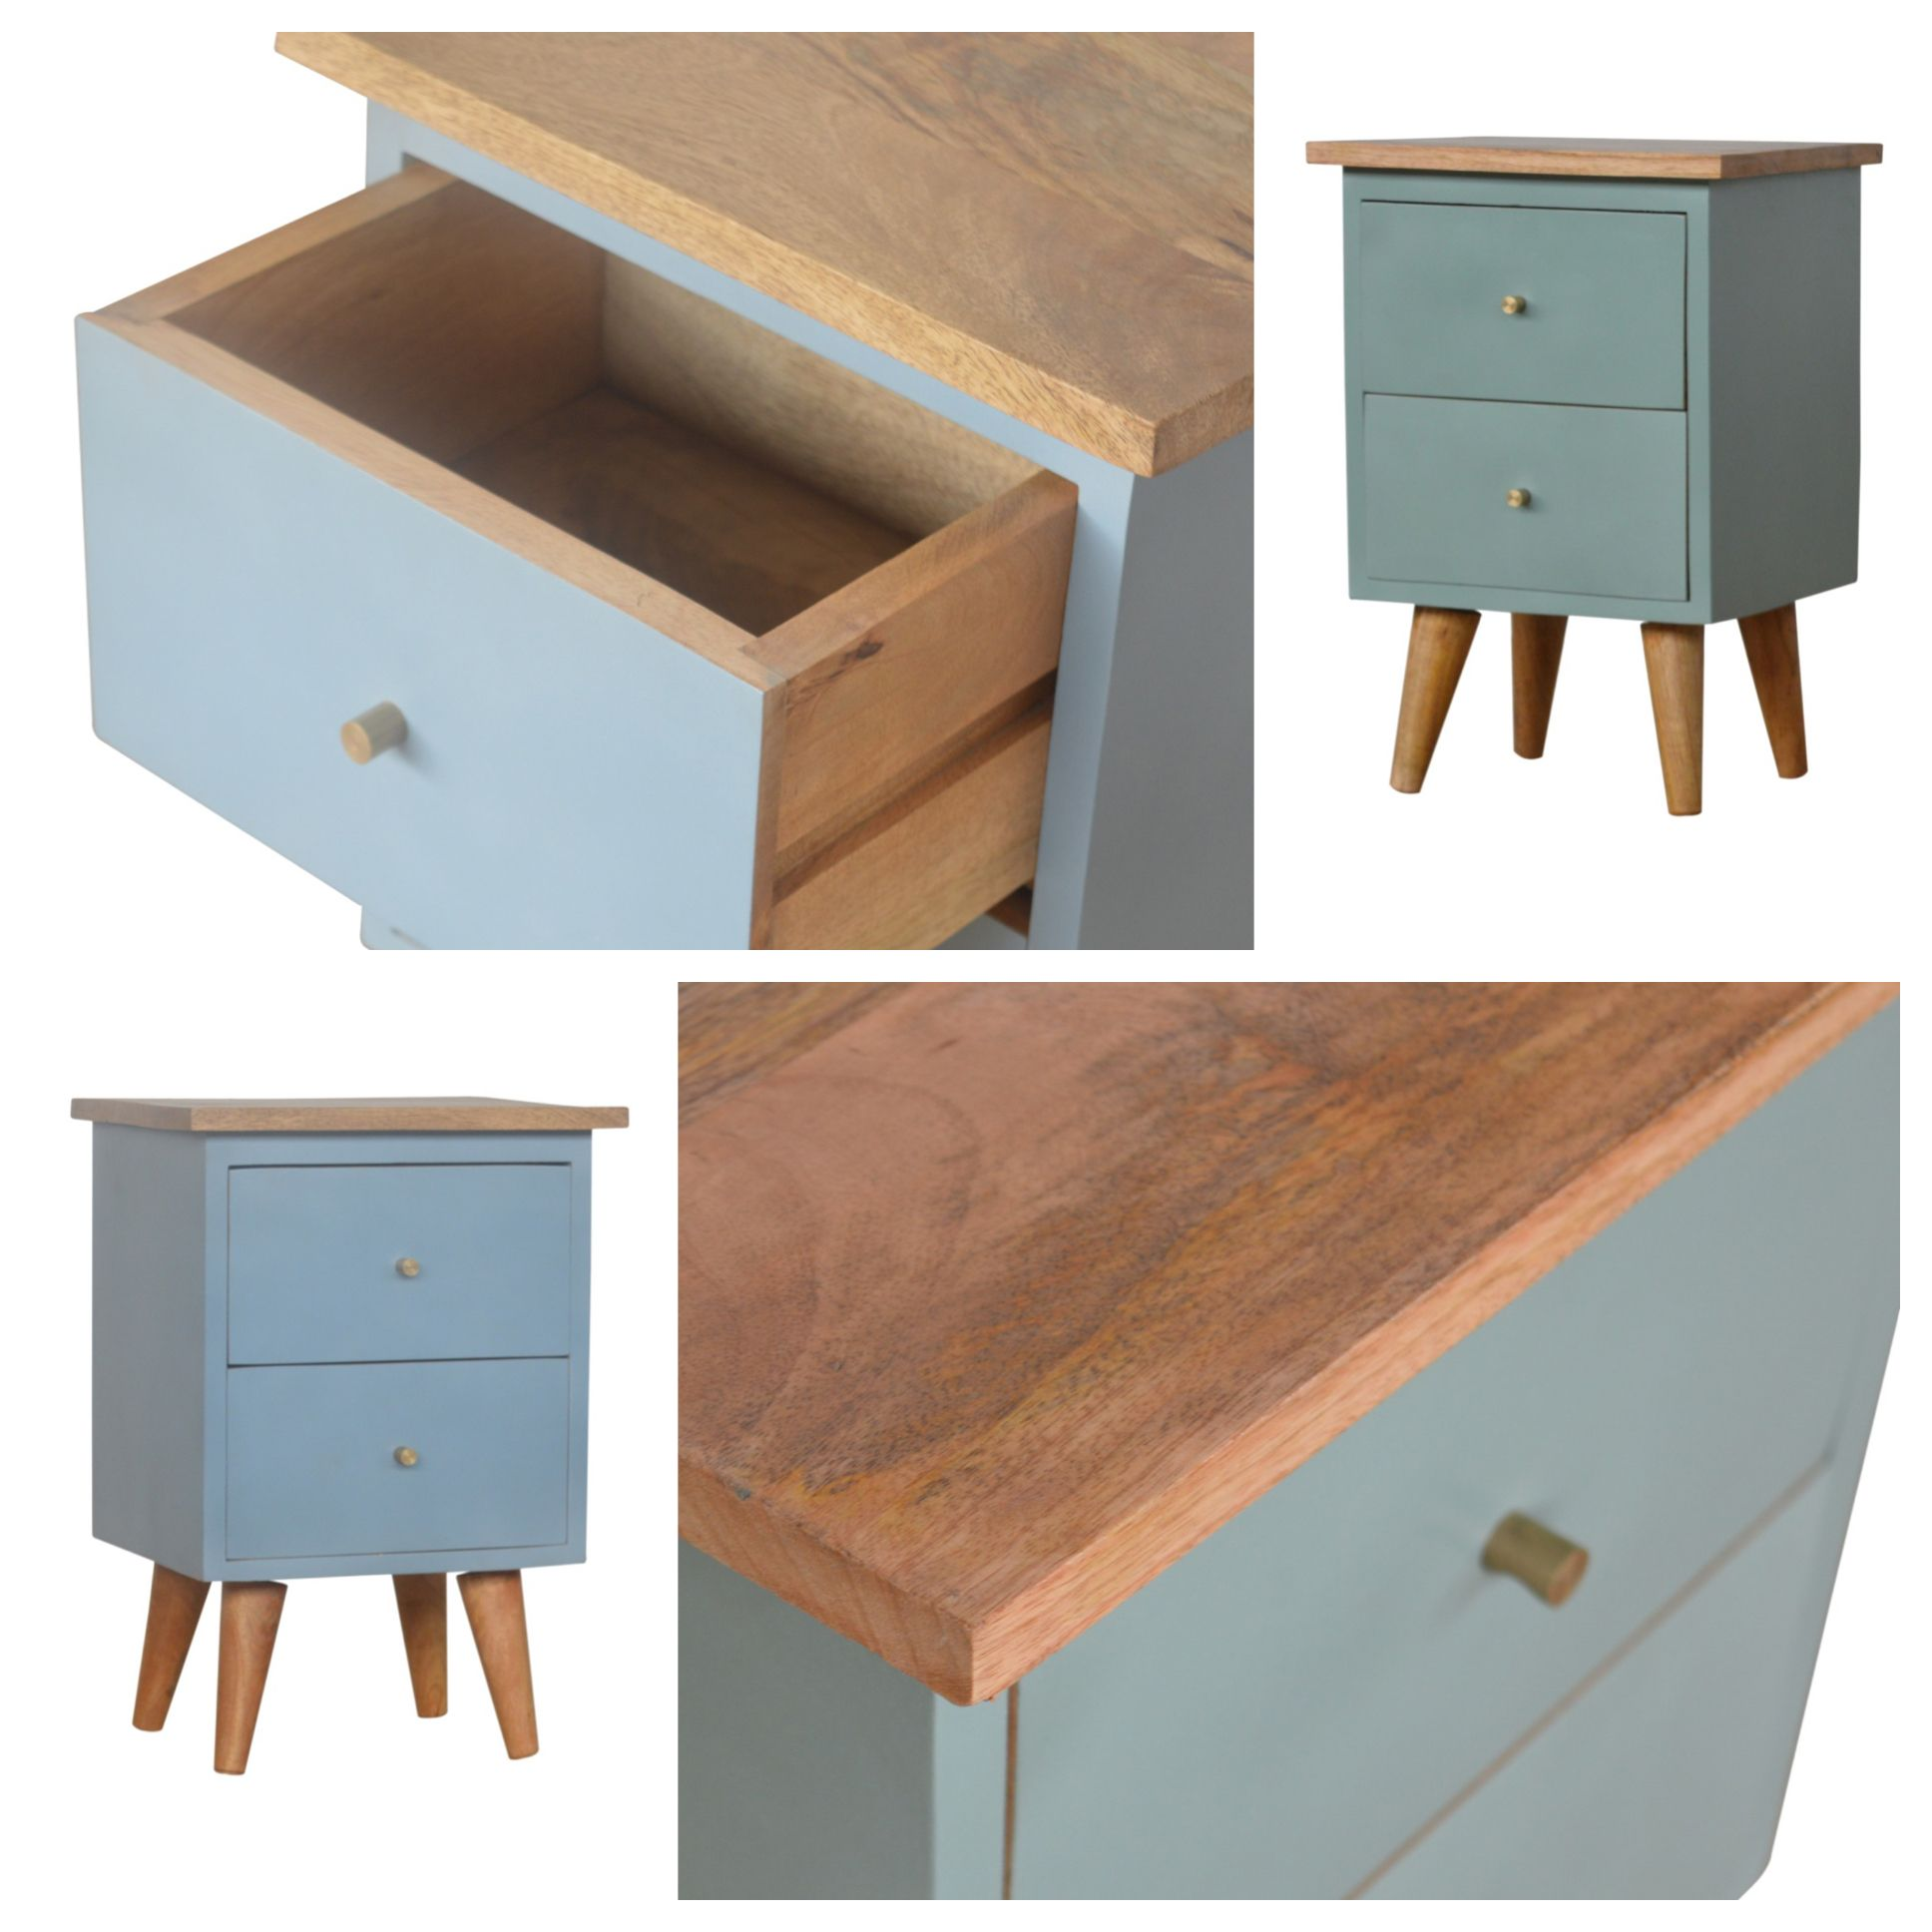 Wholesale Furniture Wholesale furniture, Furniture